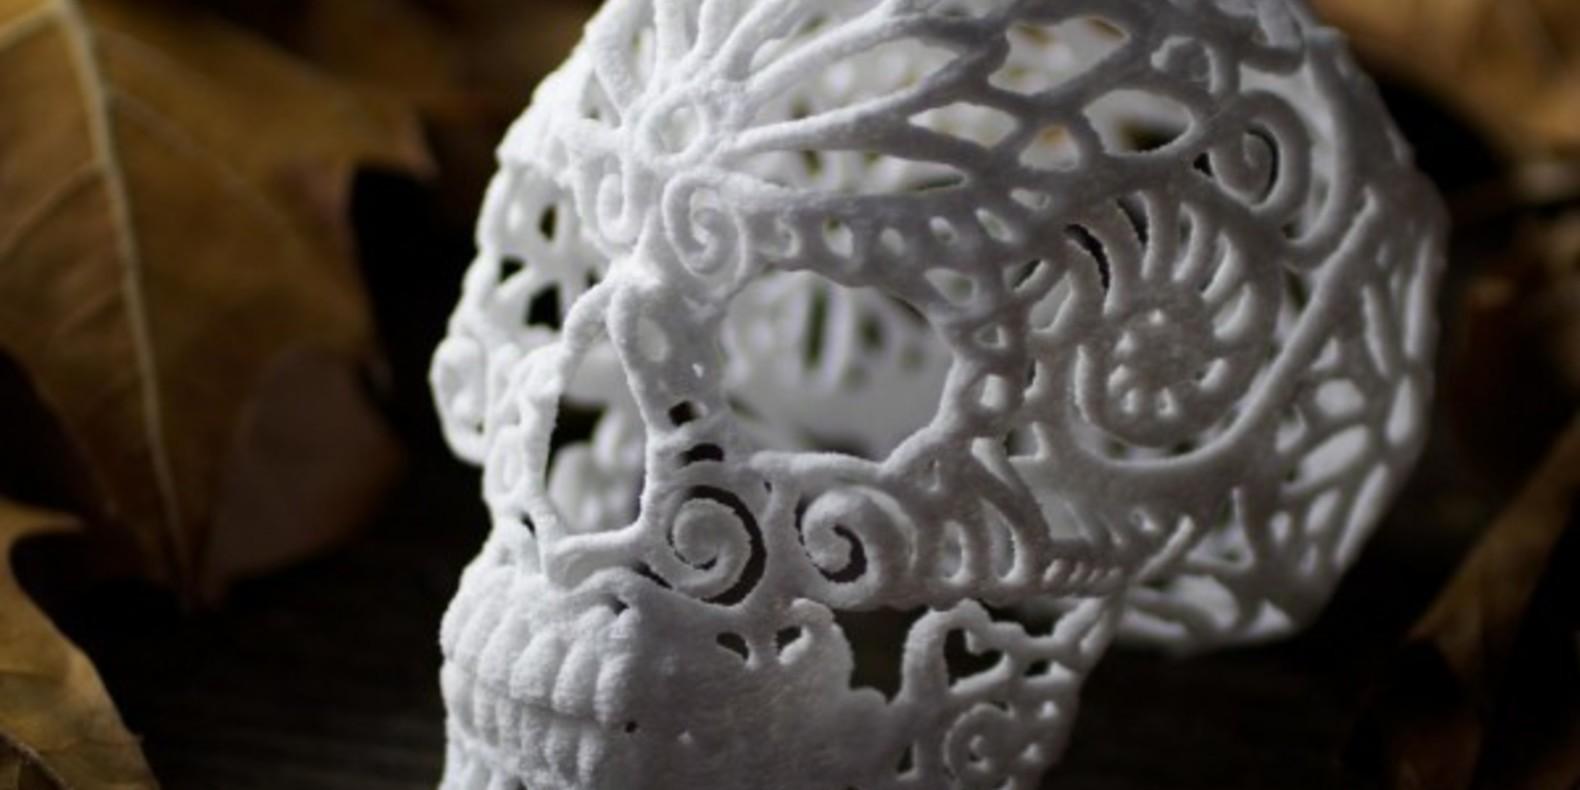 joshua josh harker designer design fichier 3D halloween sucre sugar lab skull crâne imprimé en 3D tête de mort cults cults 3D